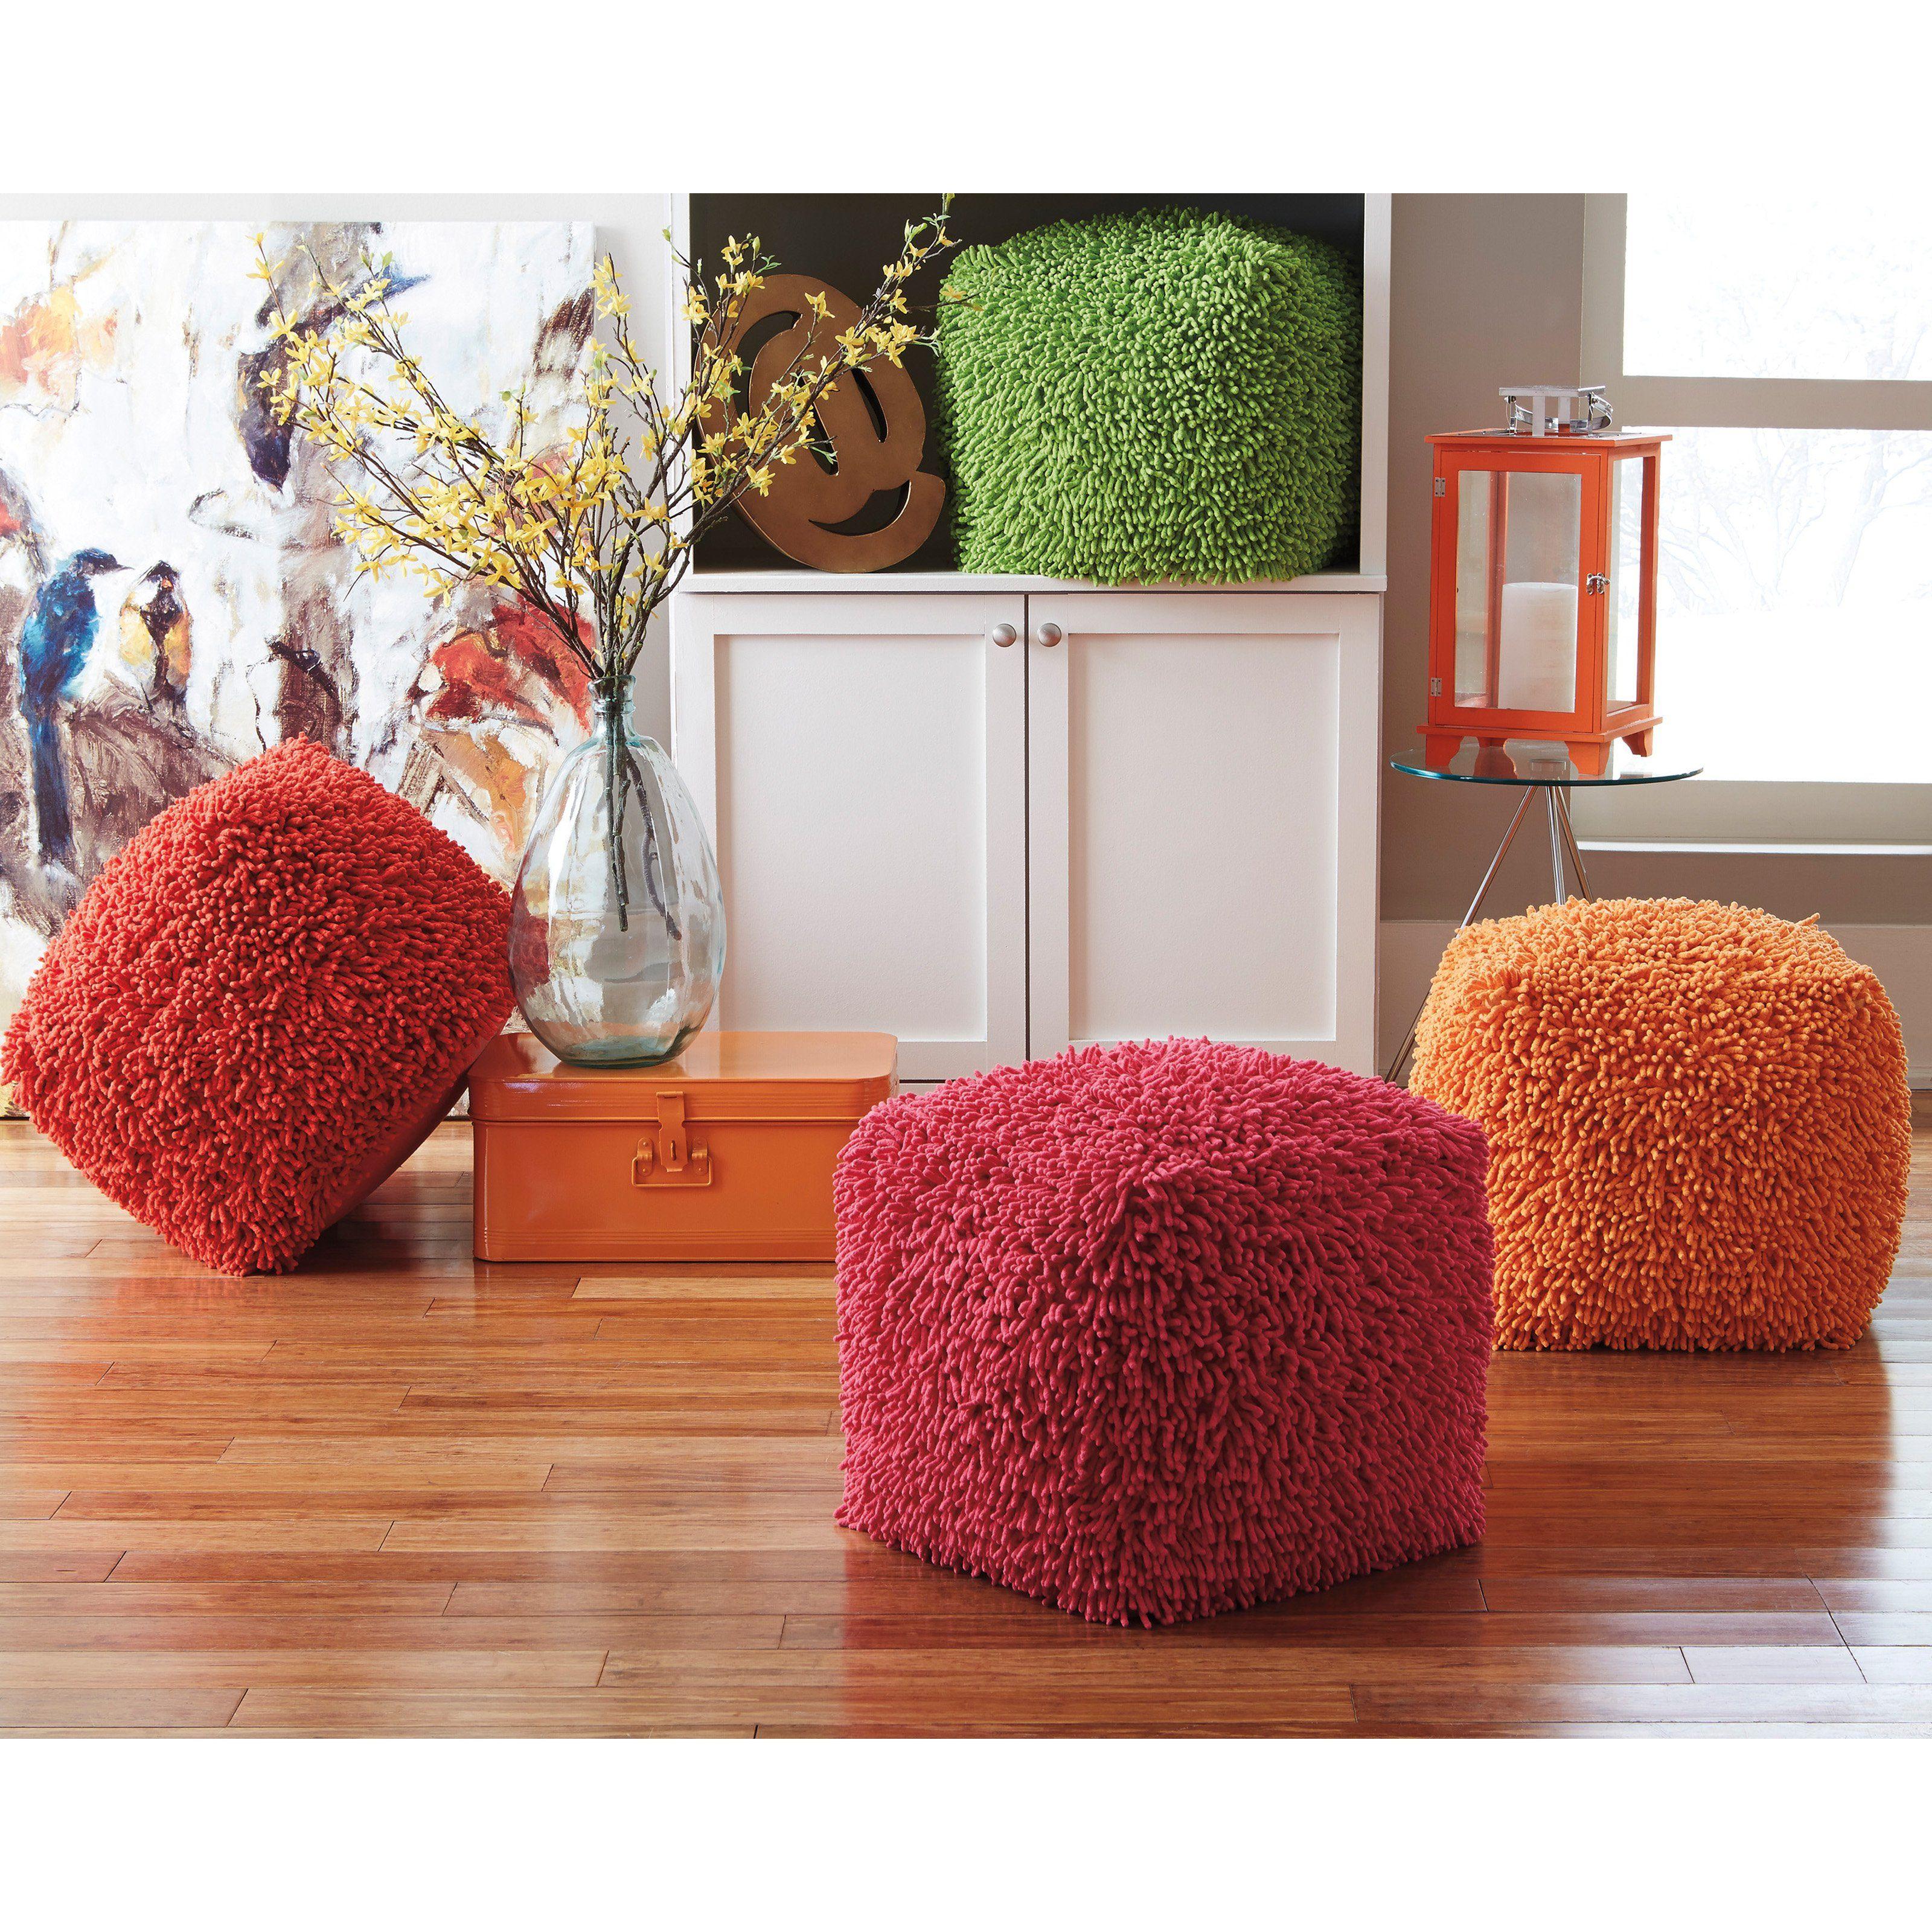 living room poufs%0A Room